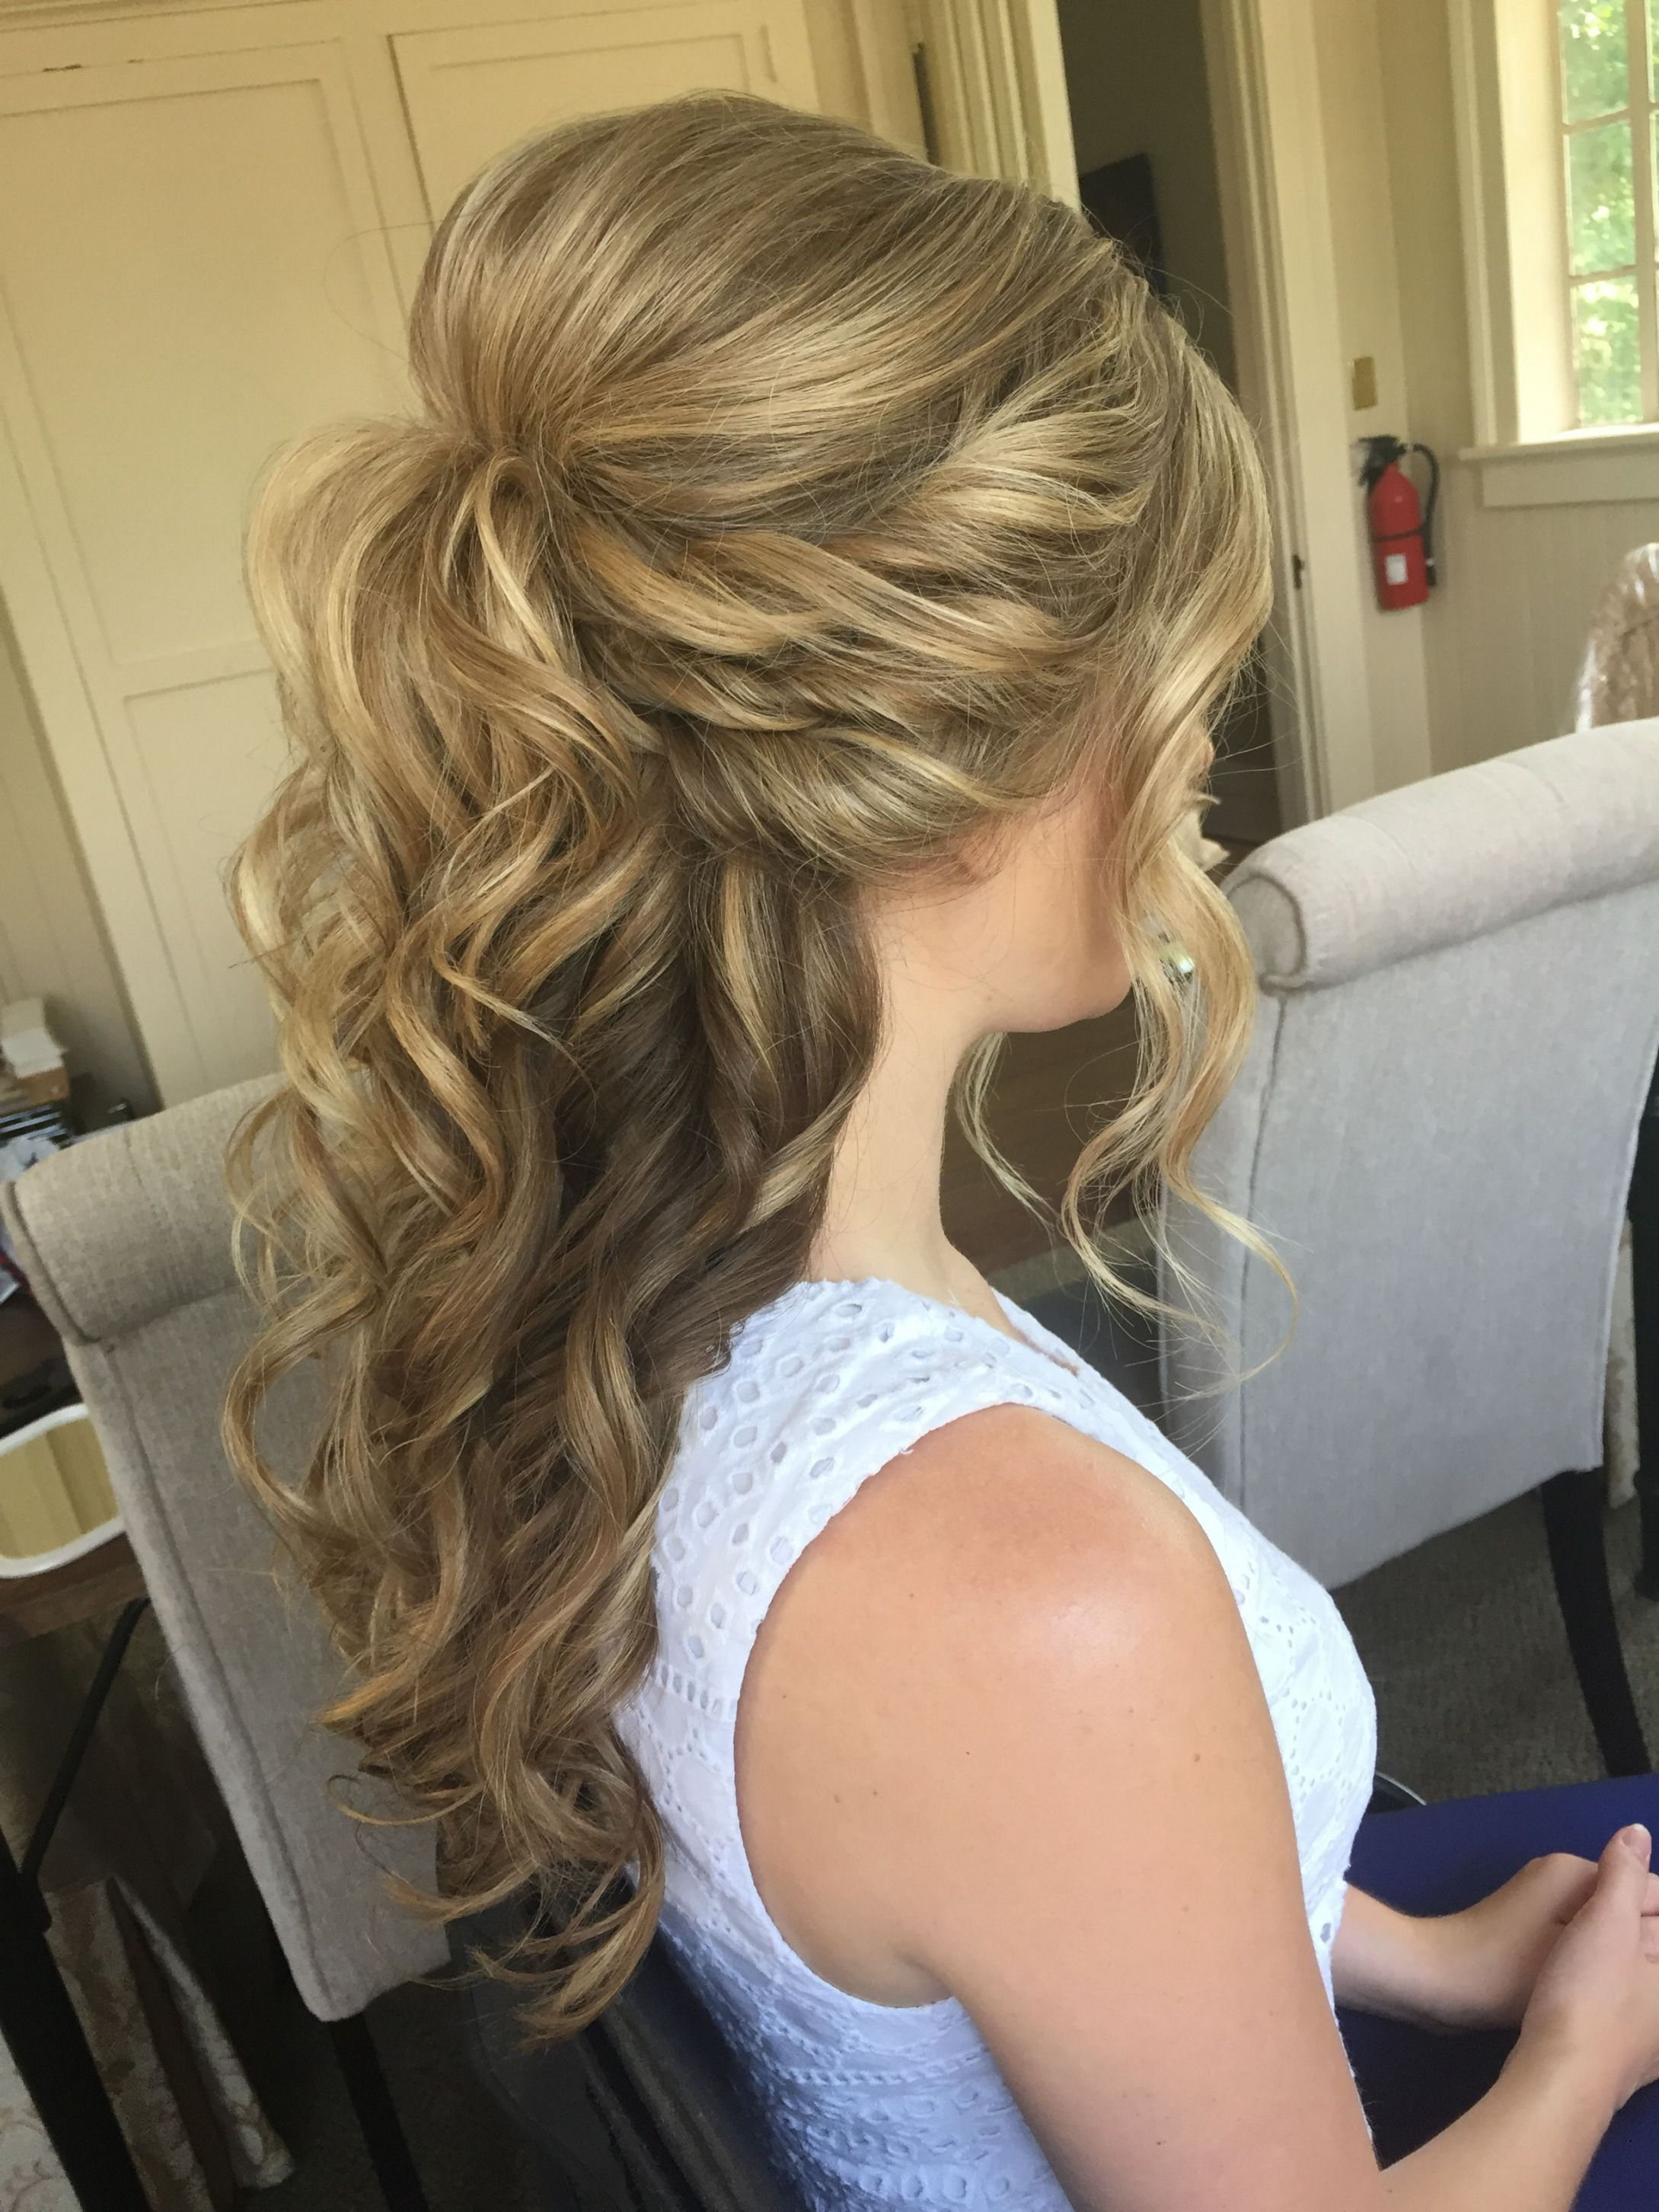 Image Result For Wedding Hairstyles Half Up Half Down Medium Length Hair Hair Styles Medium Hair Styles Long Hair Styles